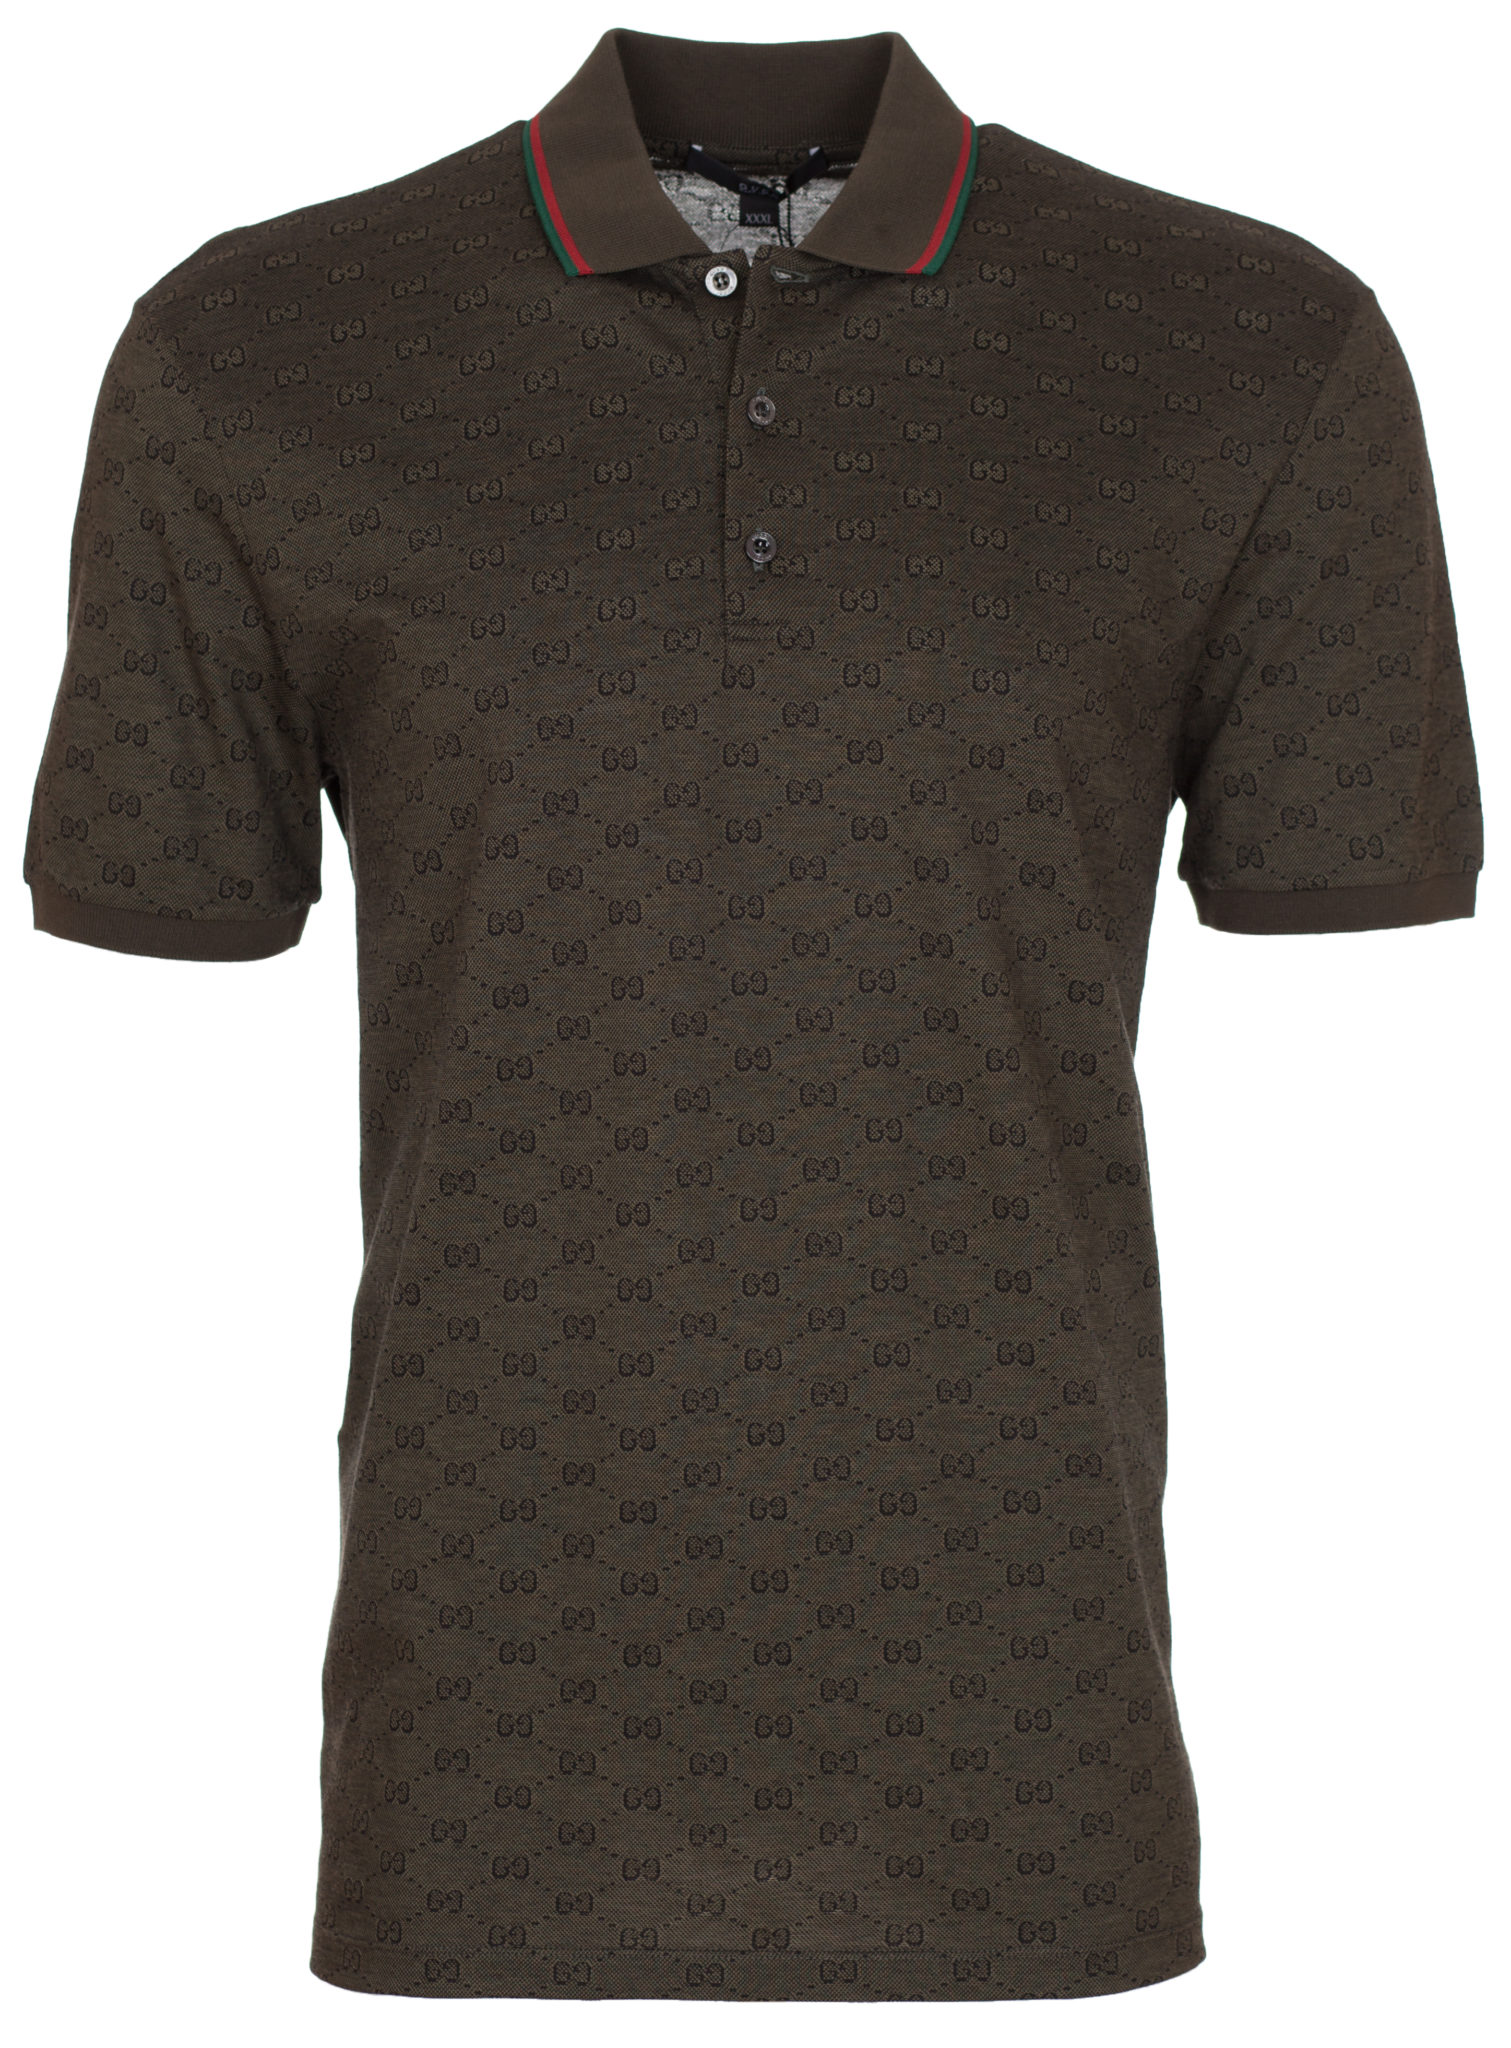 ec38b5537 Gucci Men's Military Green GG Jacquard Cotton Pique Polo Shirt